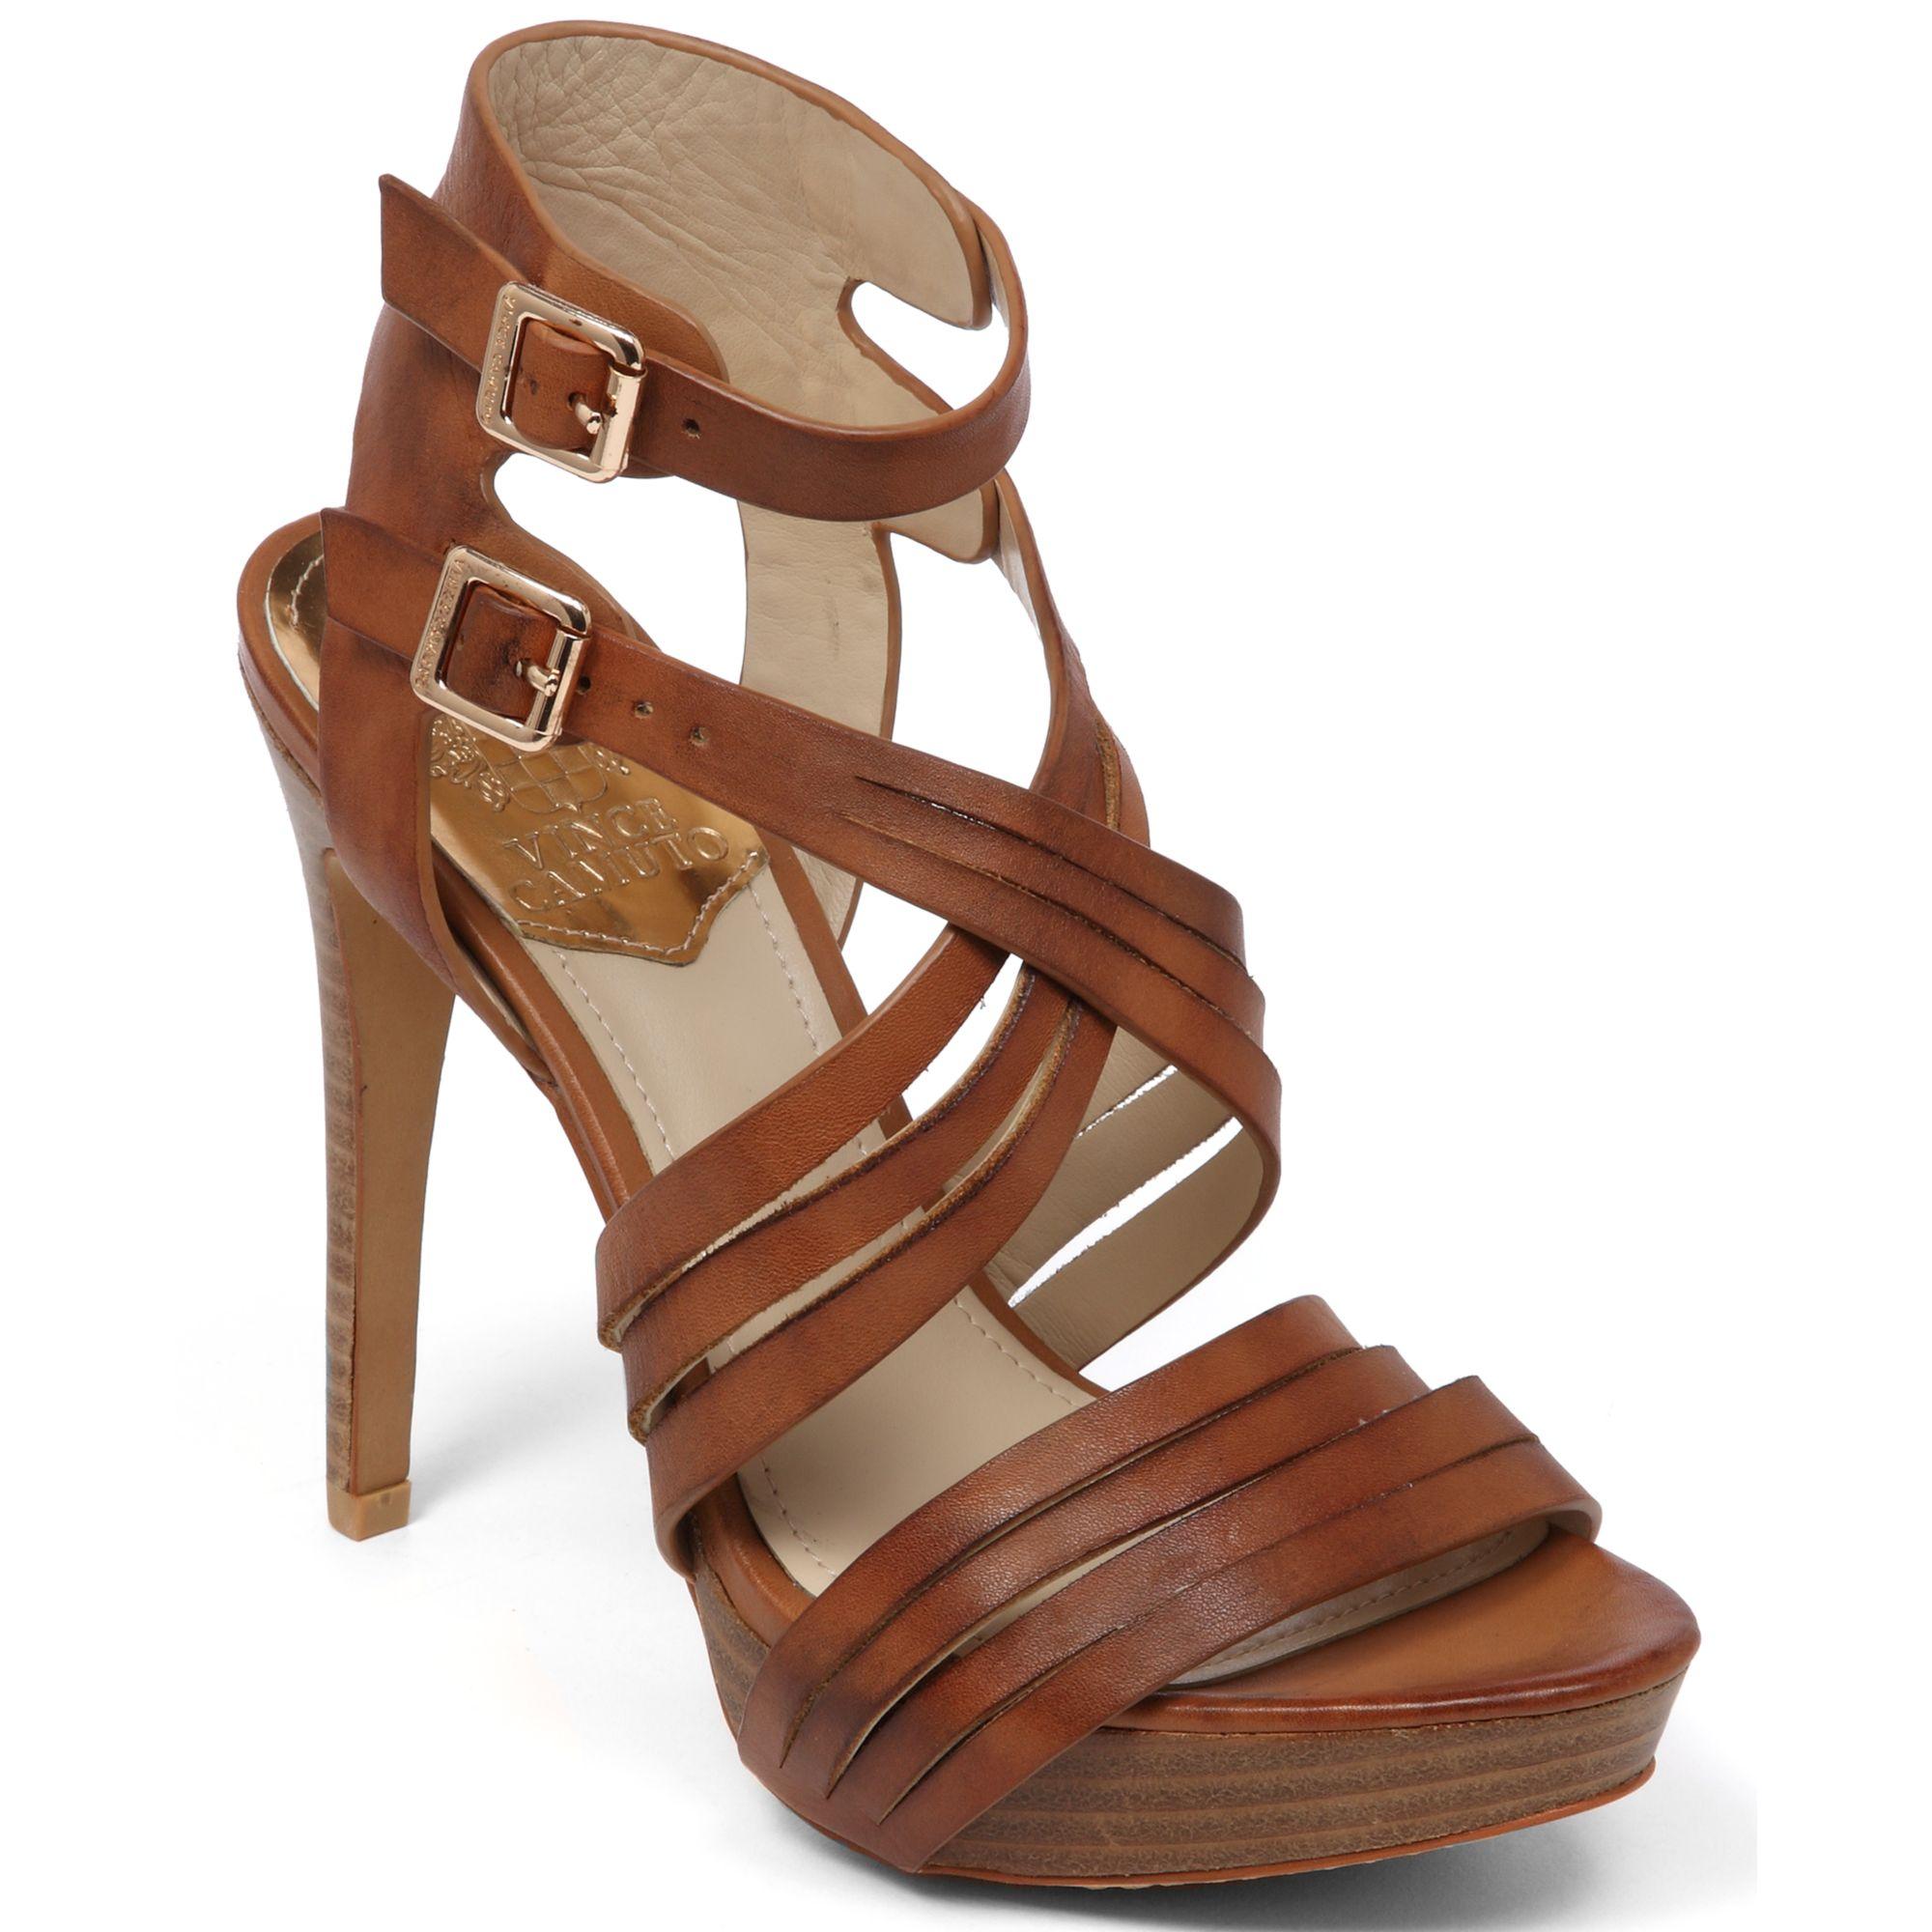 vince camuto jistil high heel platform sandals in brown lyst